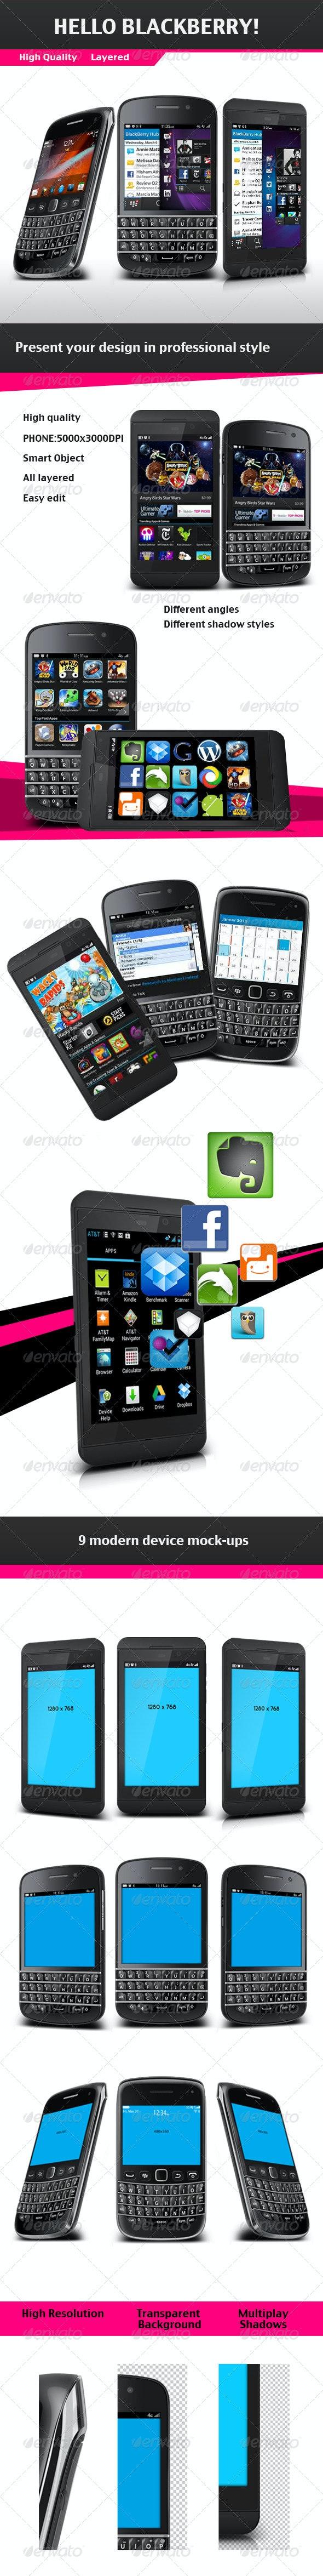 Blackberry Phone Mock-up - Mobile Displays